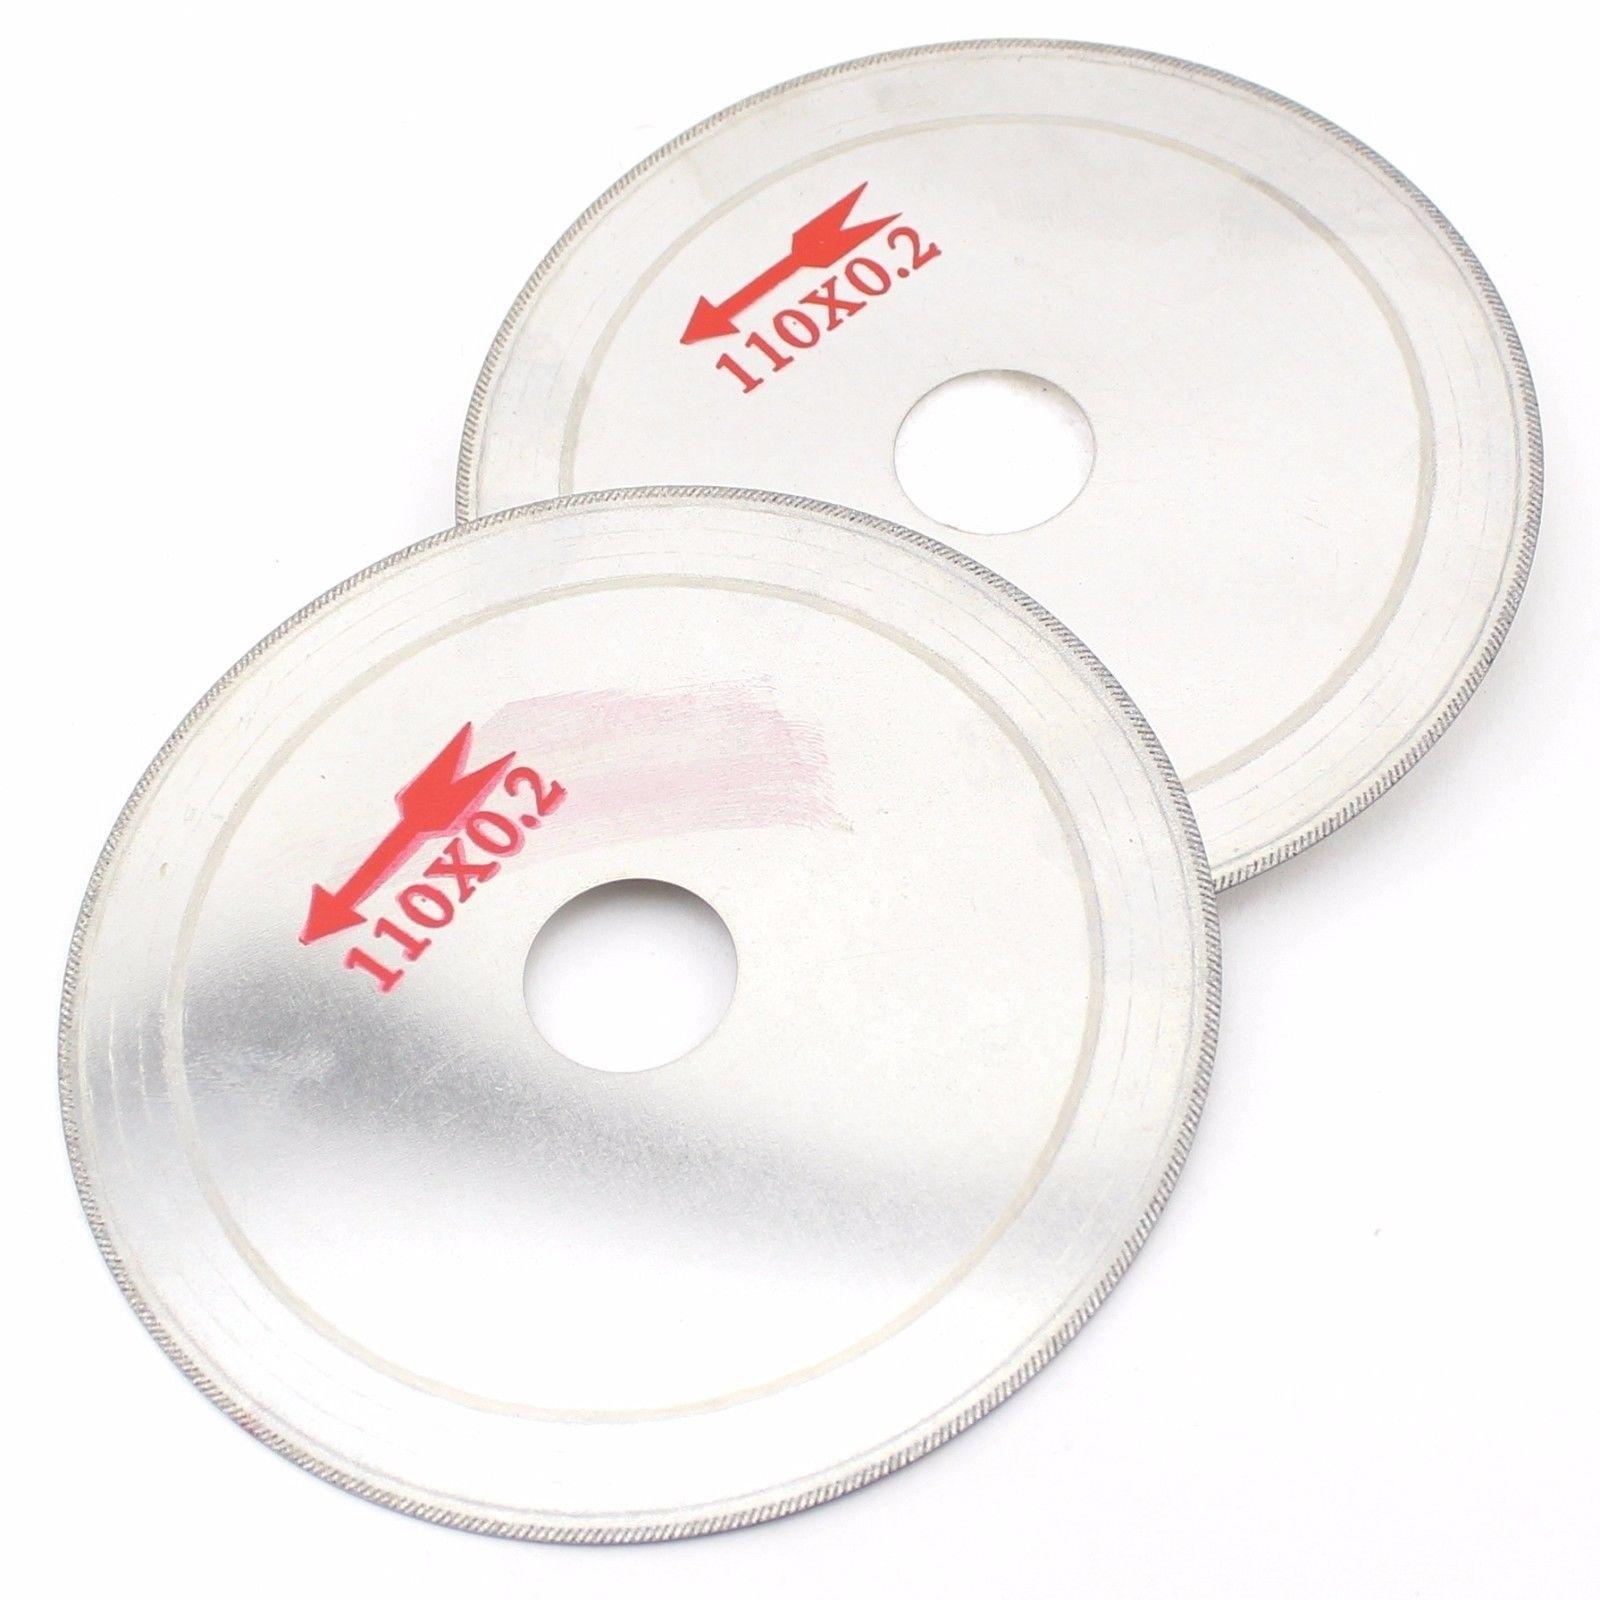 "2Pcs 4 1/2"" 110mm Ultra-thin Diamond Lapidary Saw Cutting Blade Disc 3/4"" Arbor ILOVETOOL"